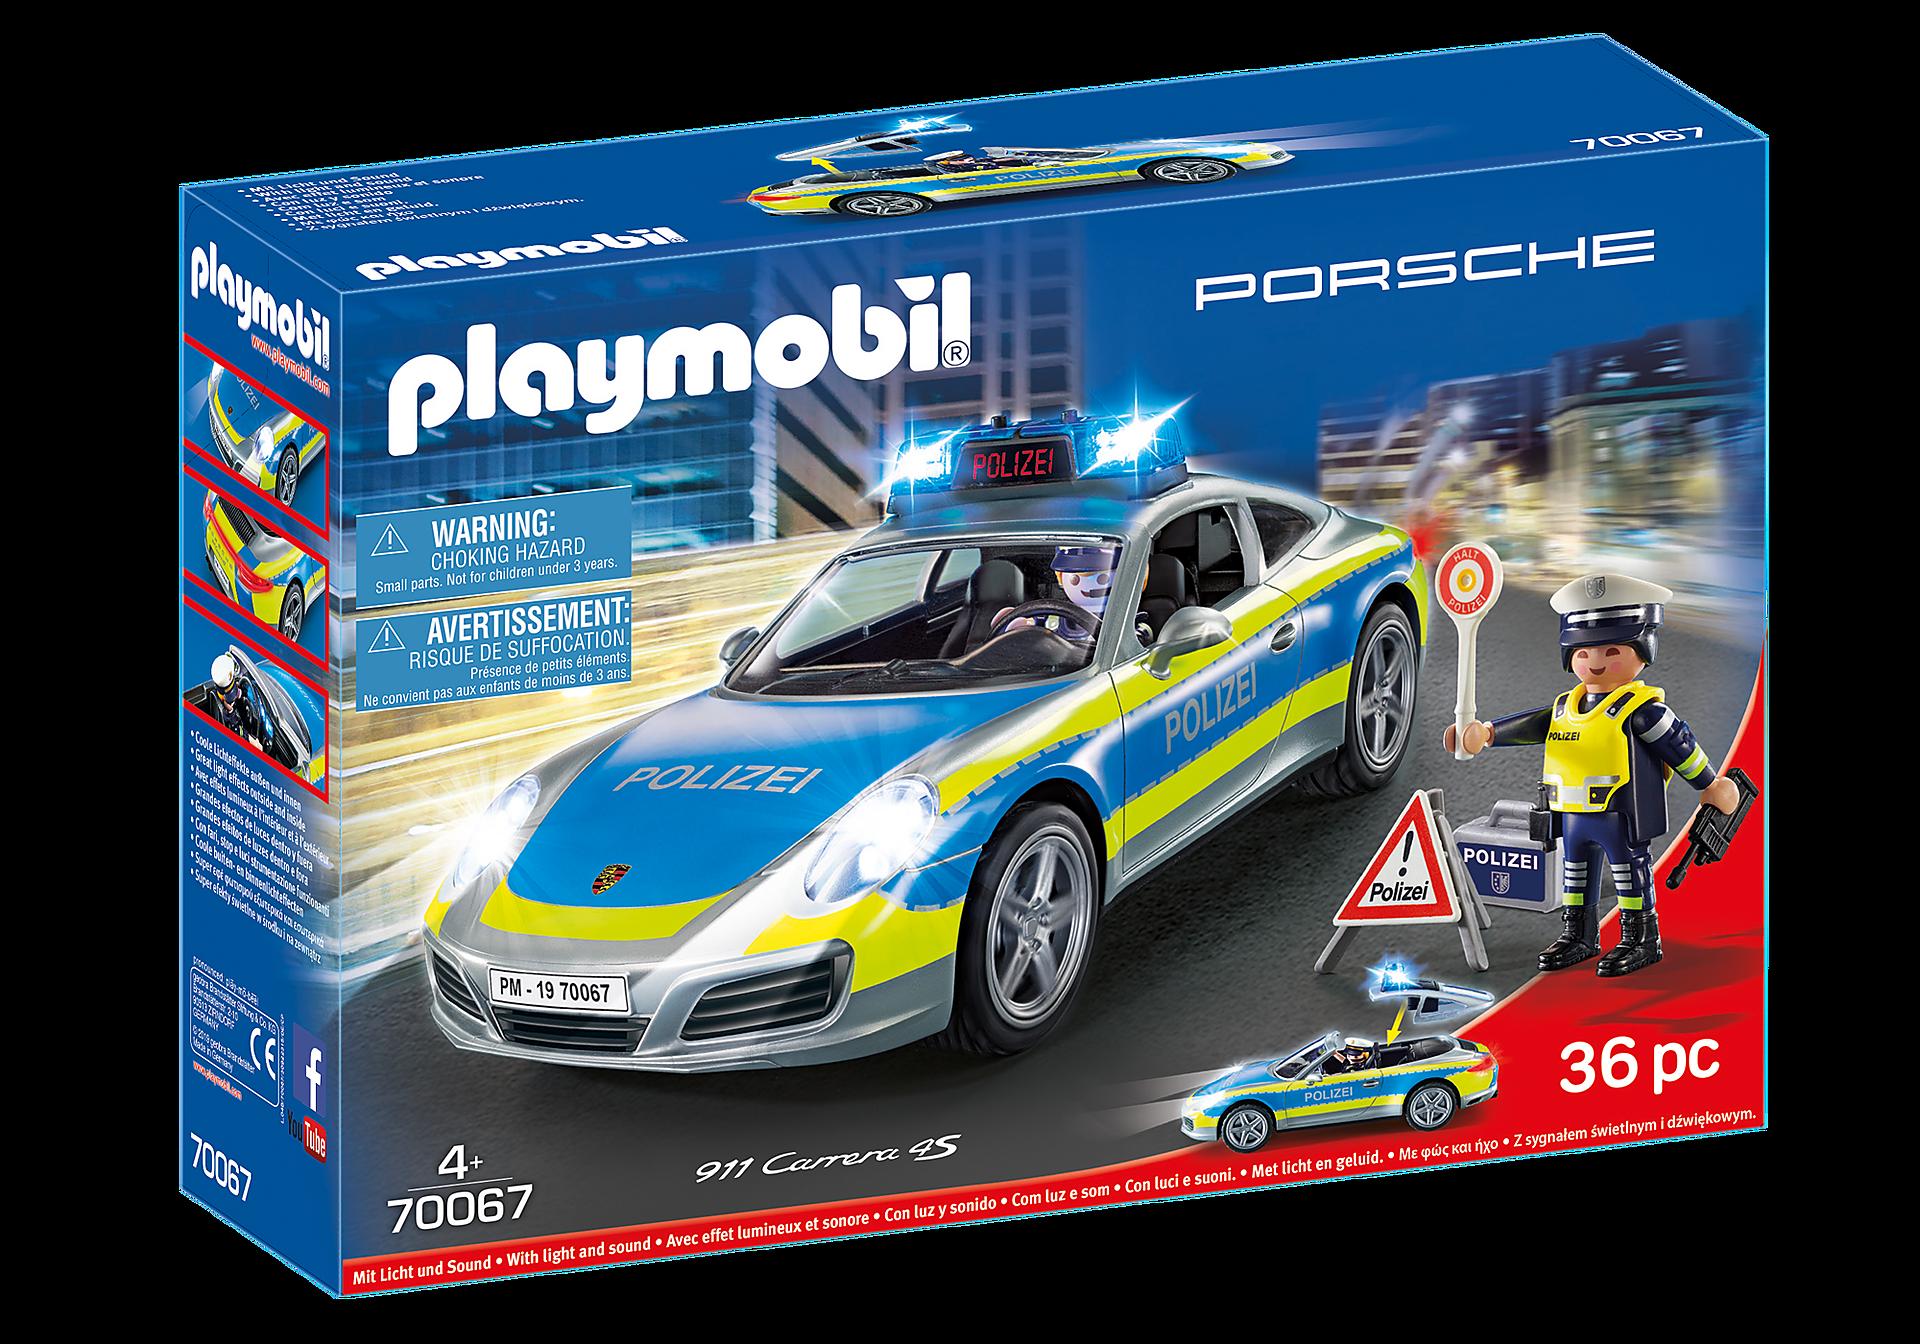 70067 Porsche 911 Carrera 4S Police zoom image2